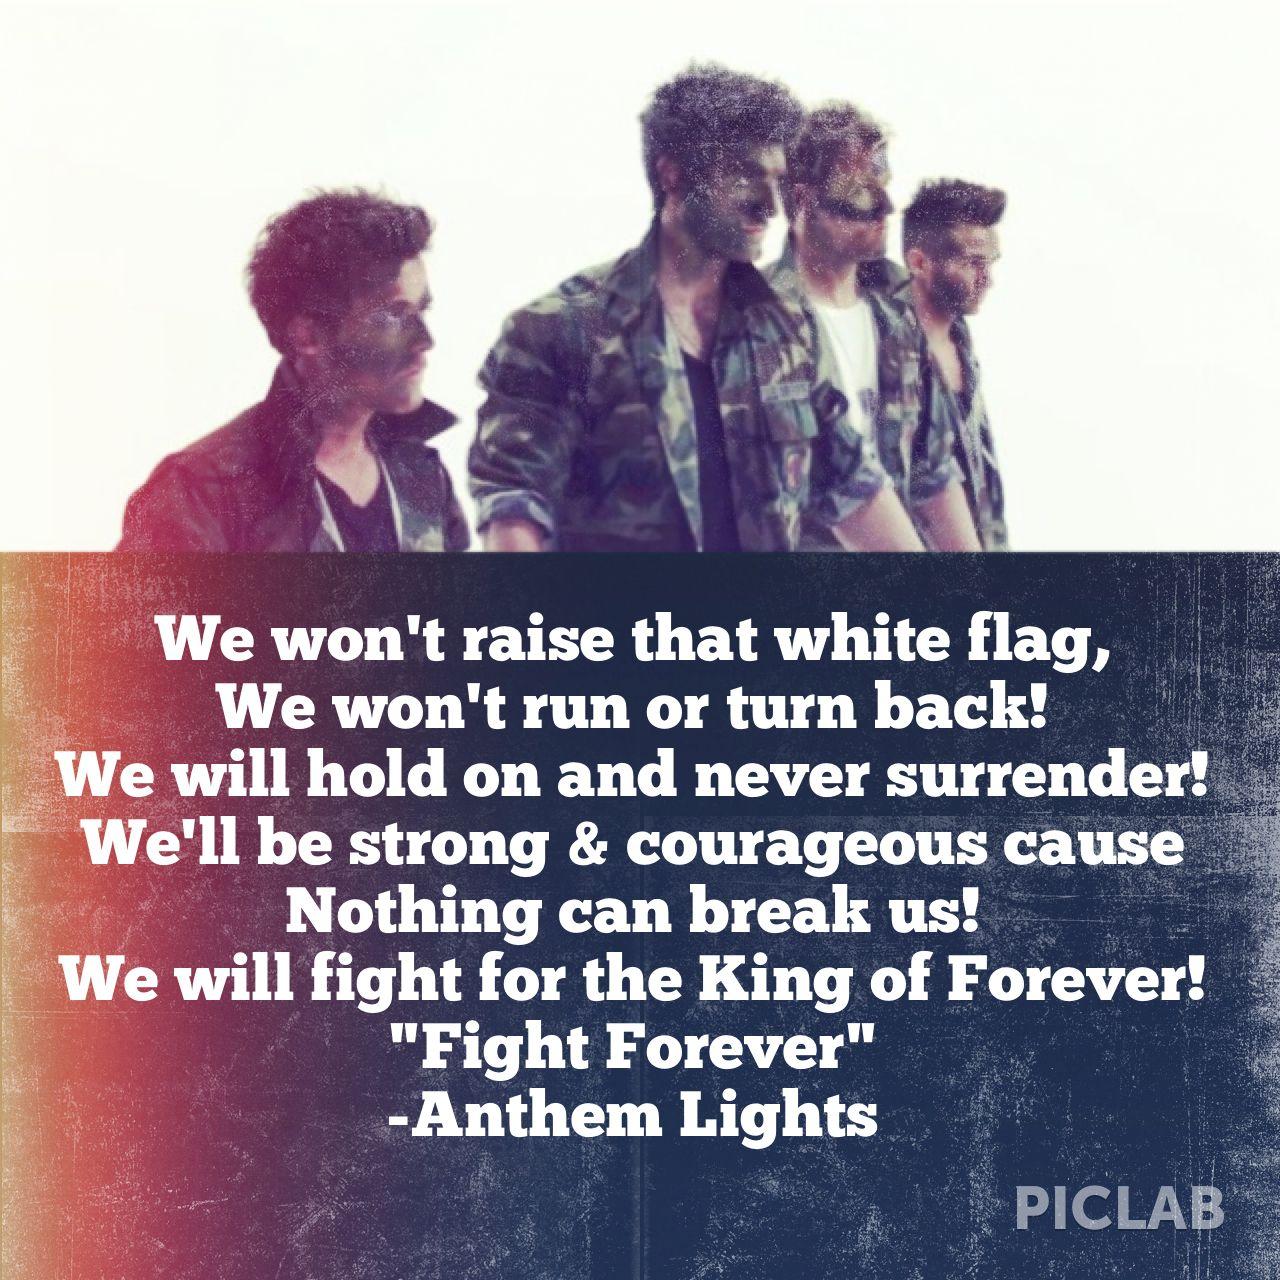 Fight Forever - Anthem Lights | Anthem Lights <3 | Anthem